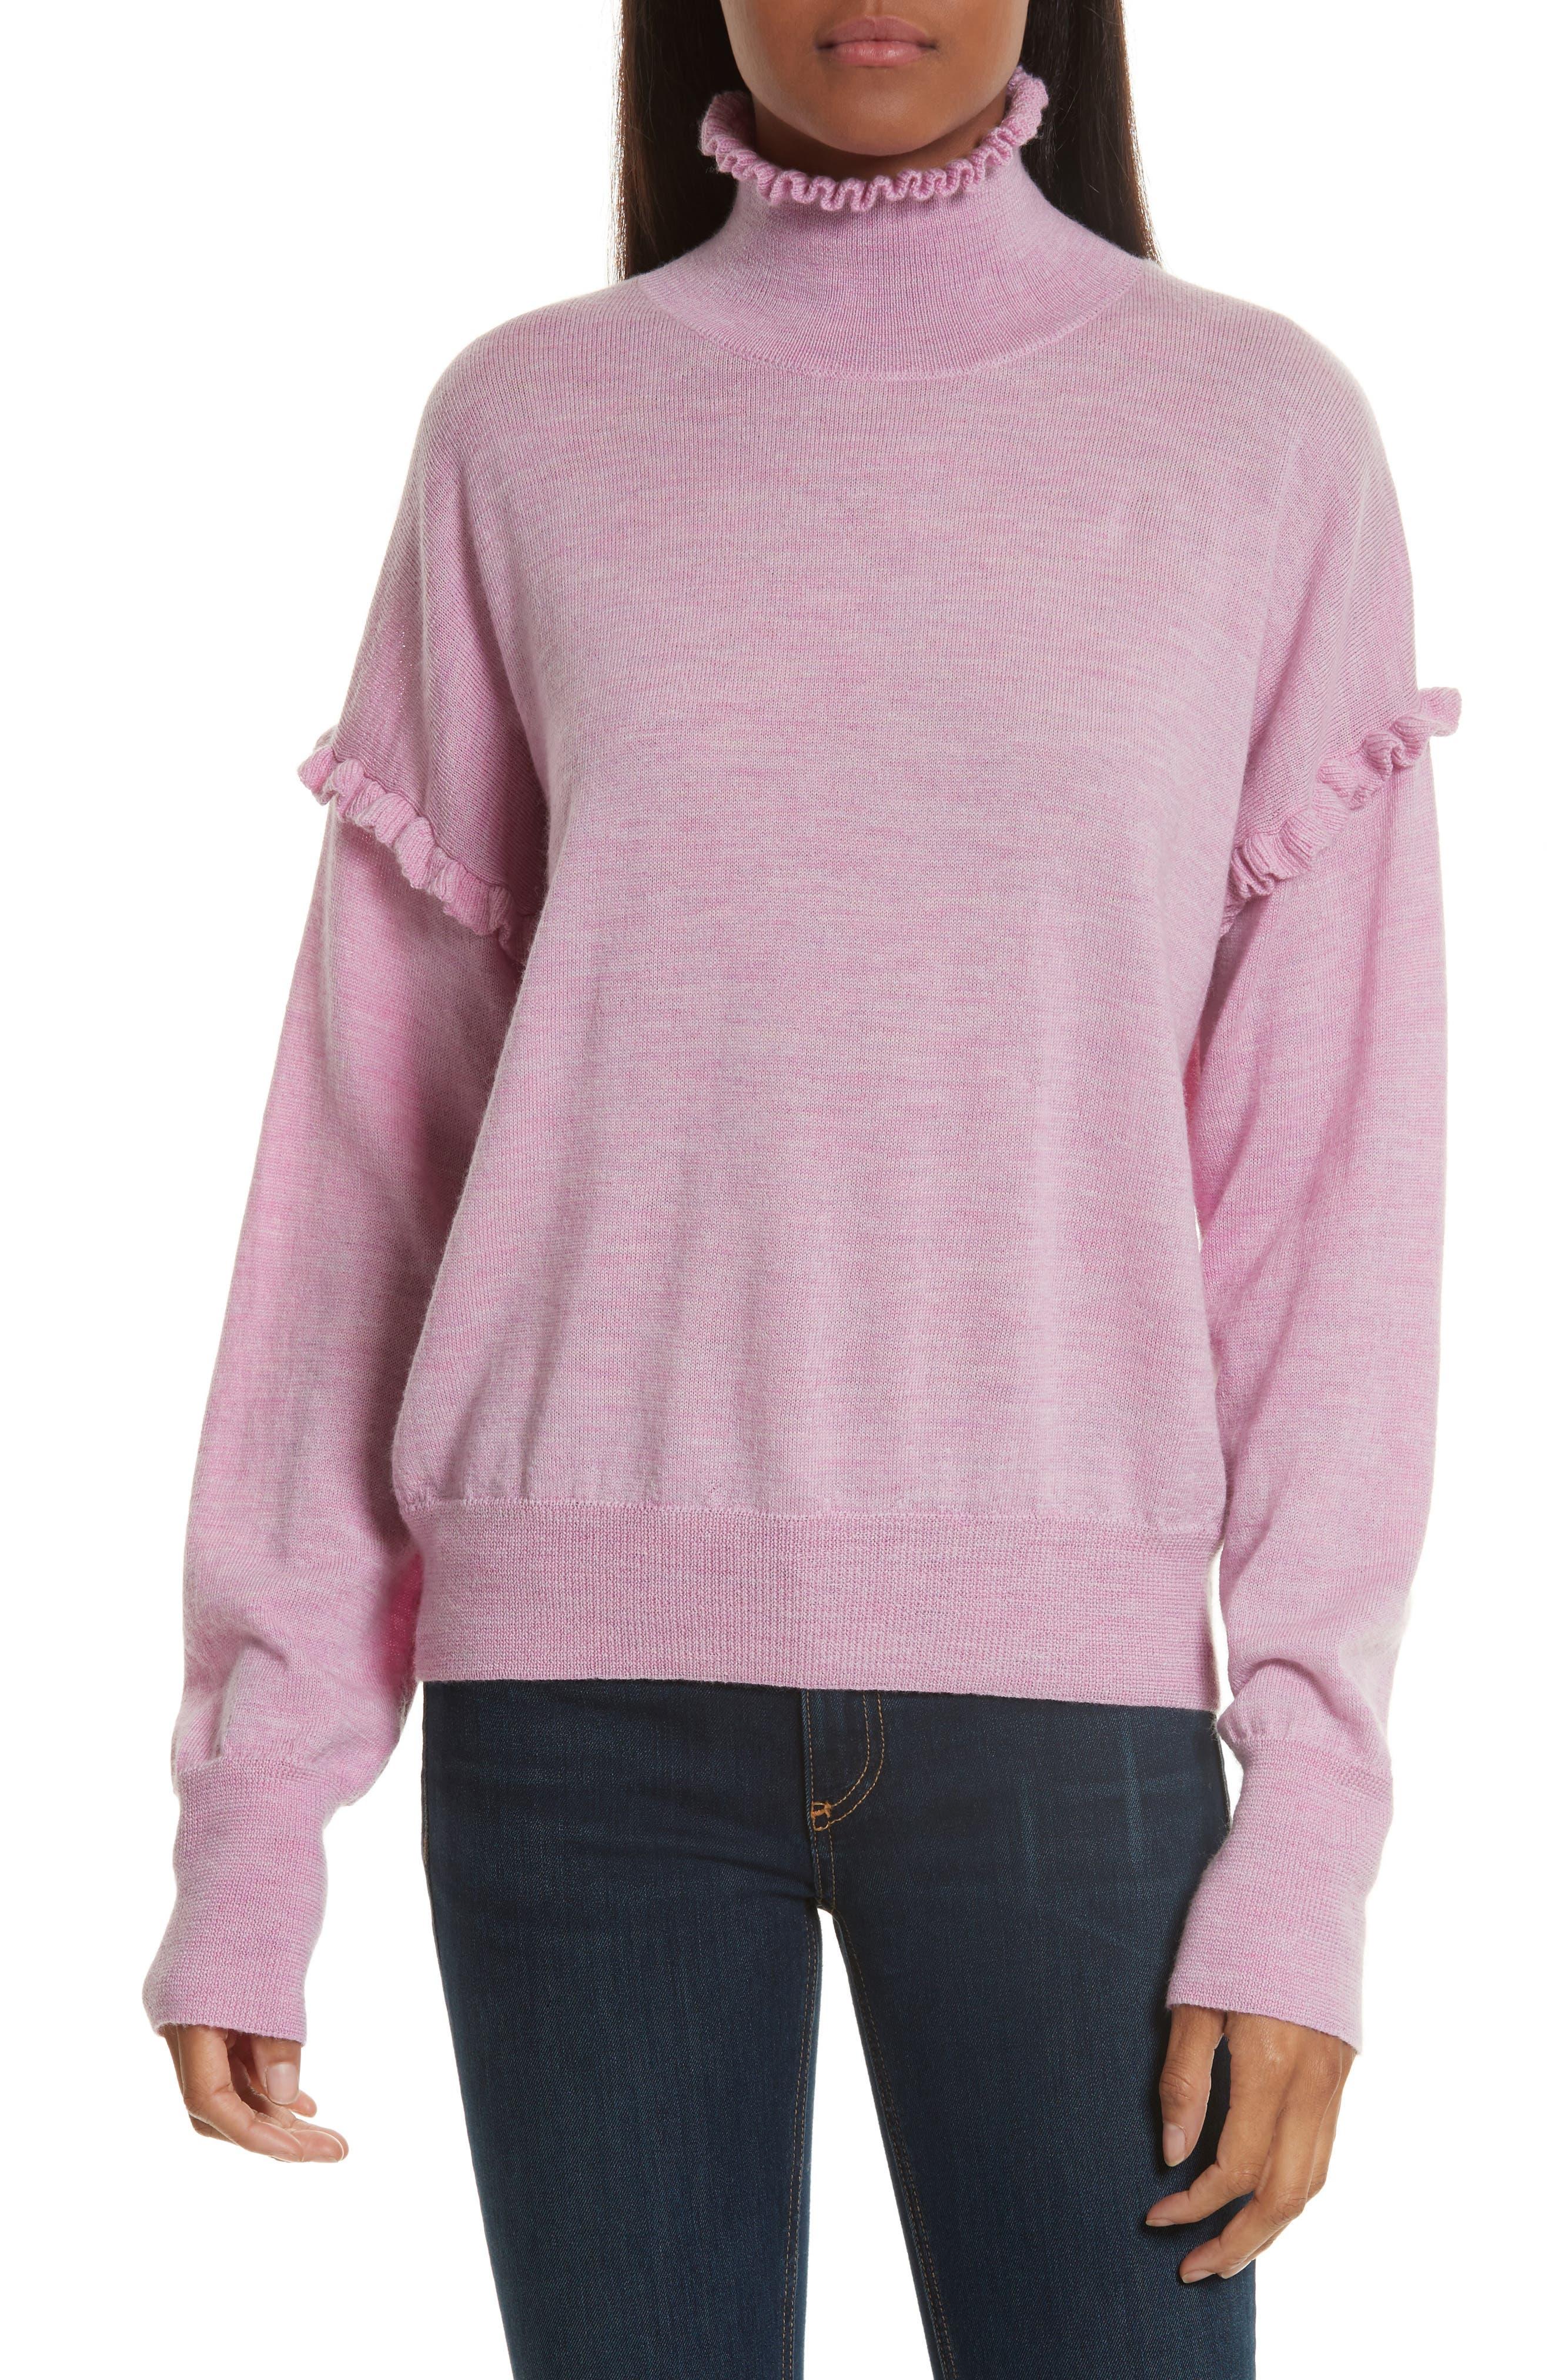 Alternate Image 1 Selected - Rebecca Taylor Turtleneck Merino Wool Sweater